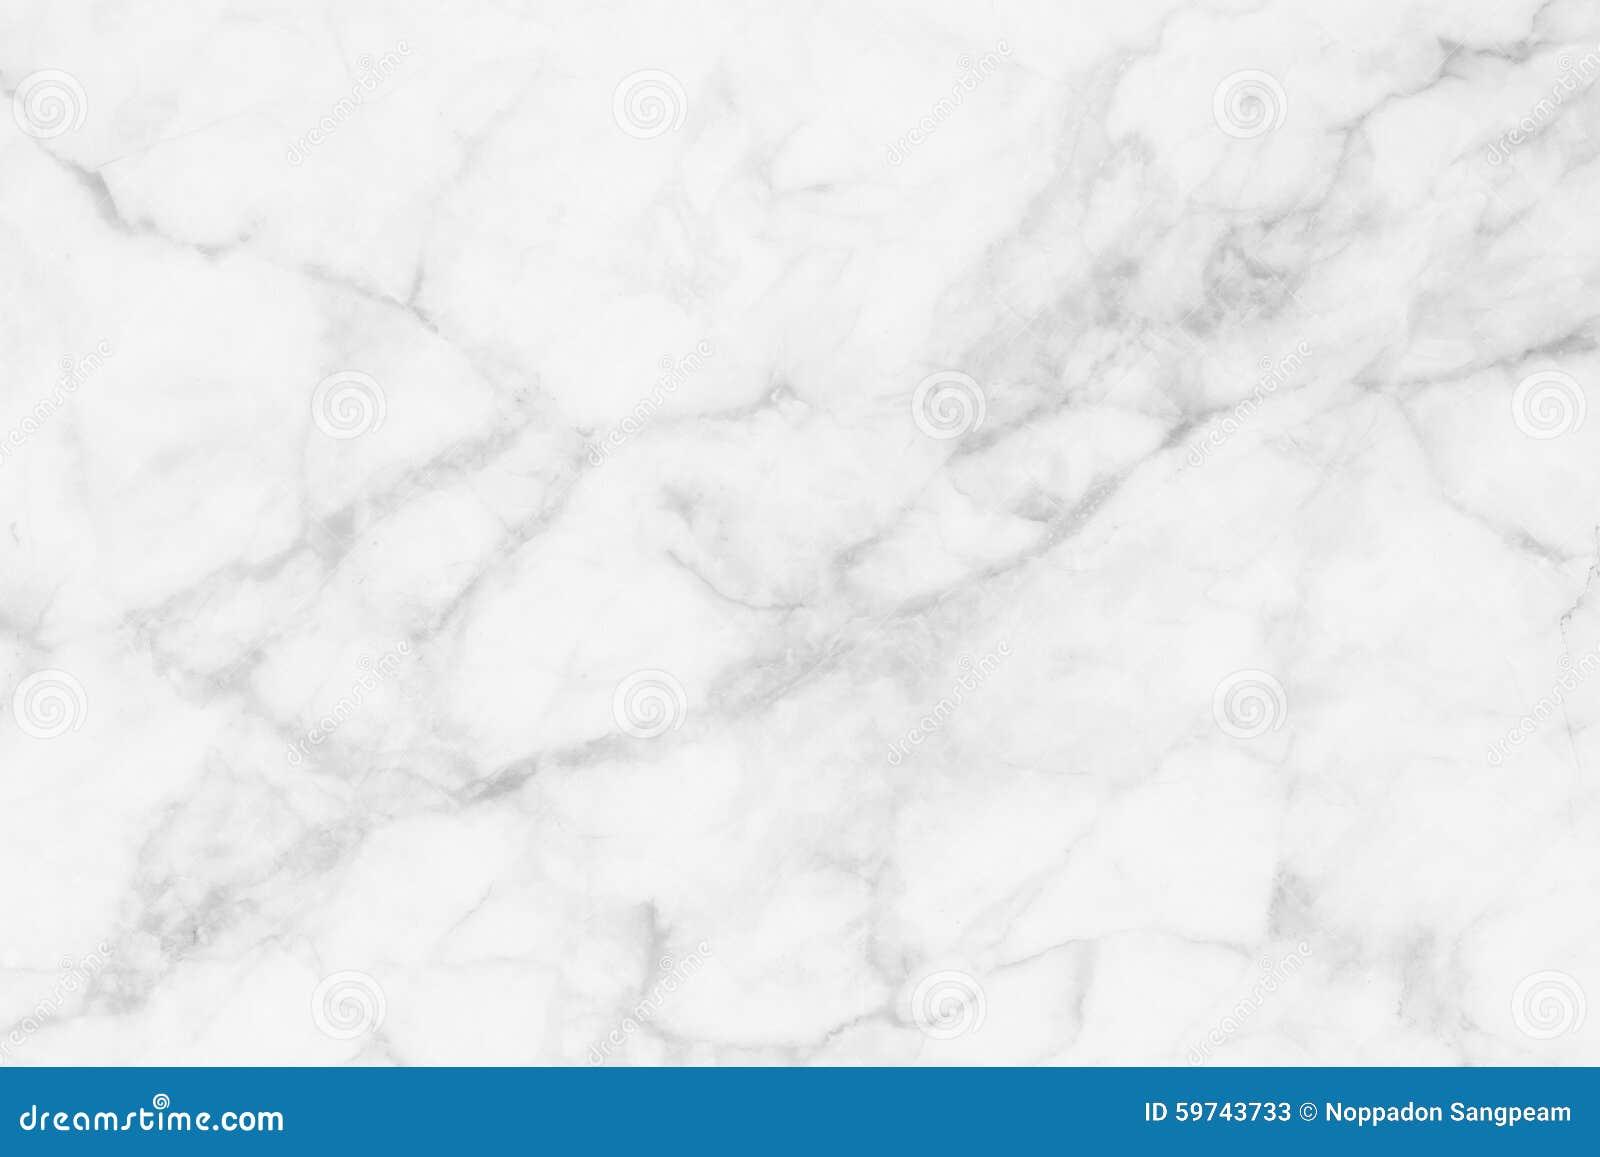 Fondo De M Rmol Blanco De La Textura Estructura Detallada